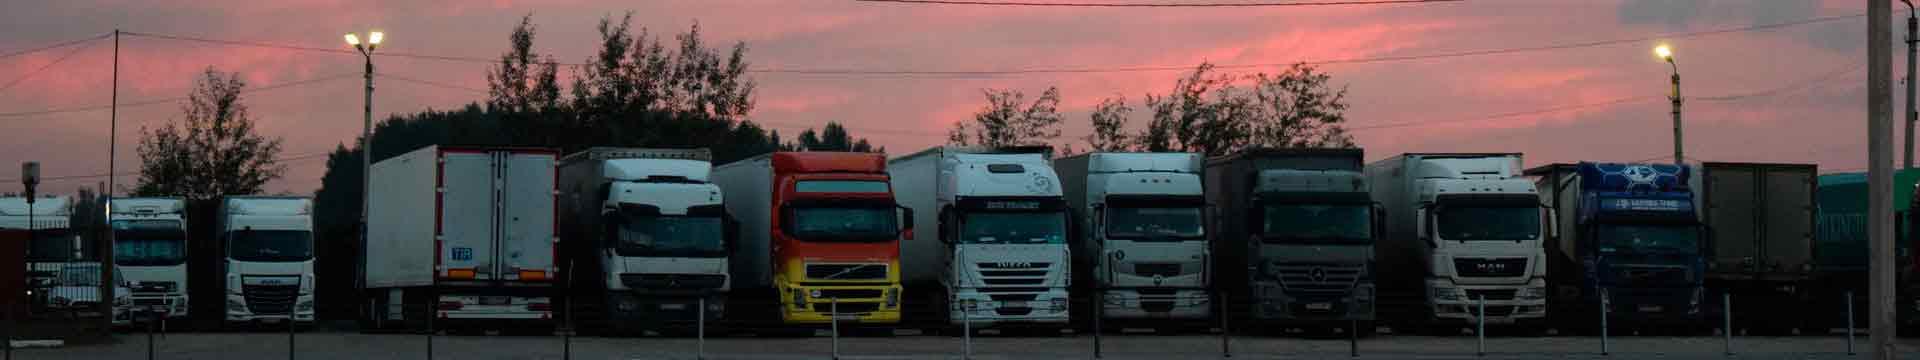 грузовики на стоянке в Липне